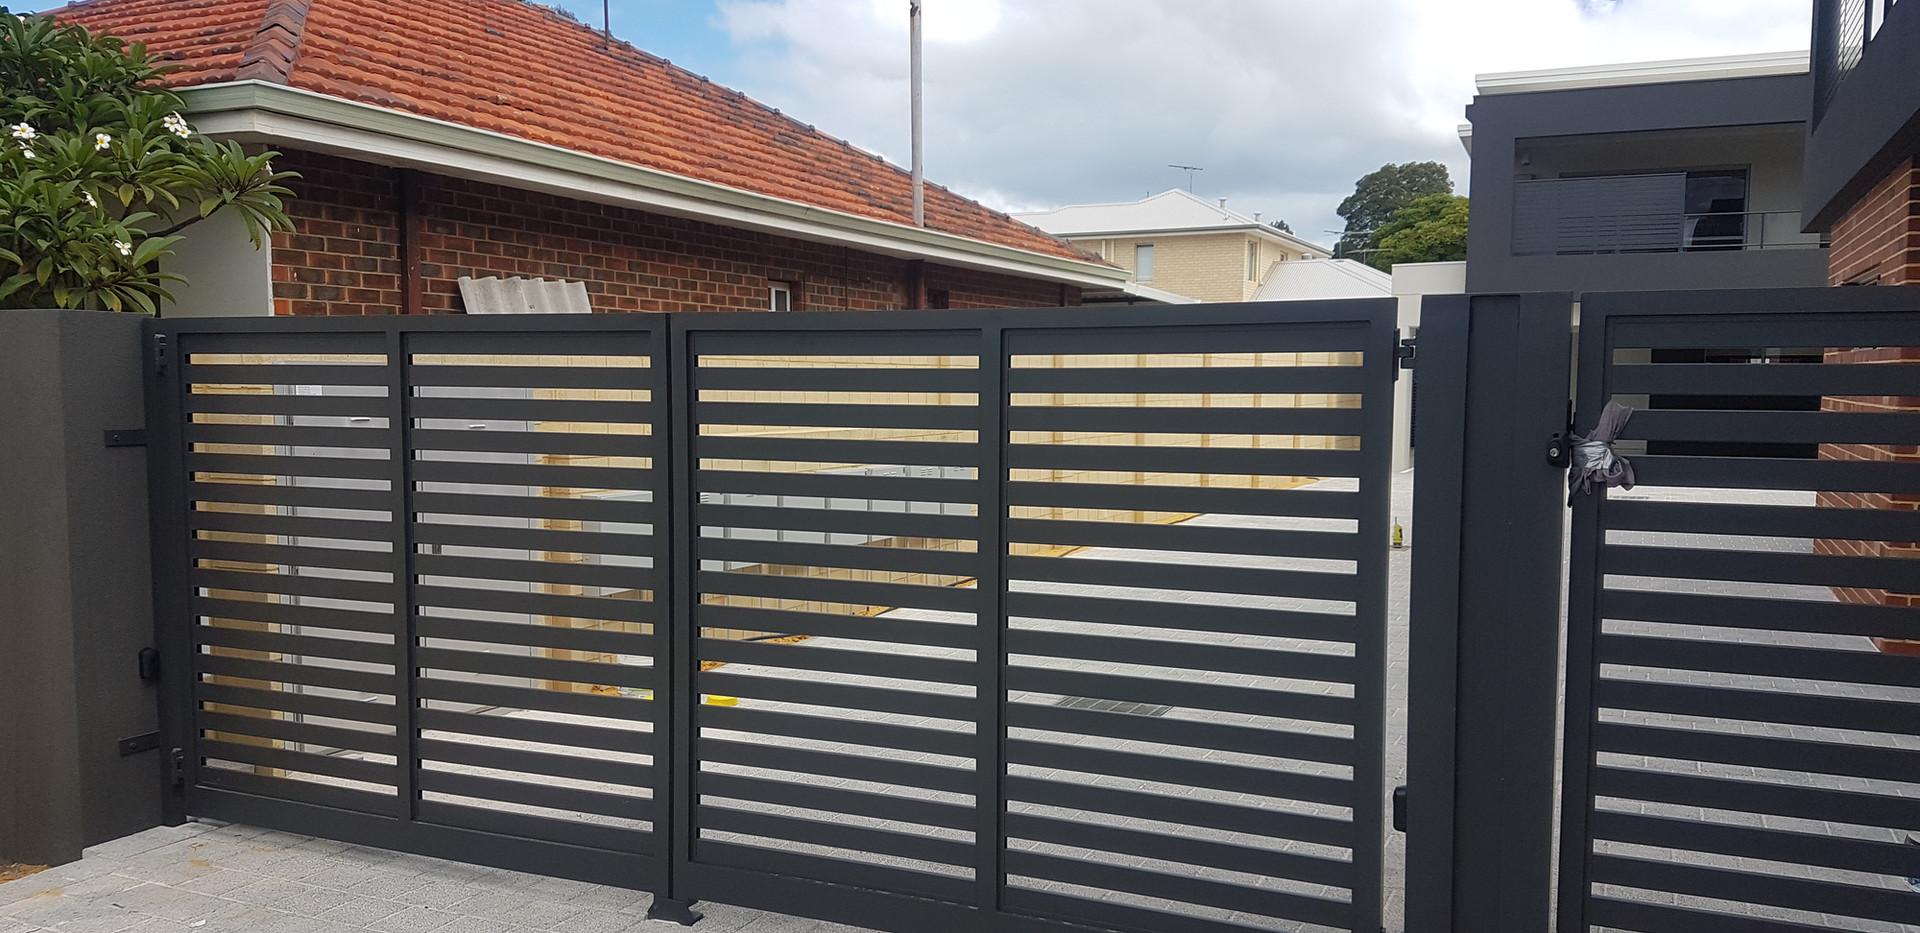 Automatic Gate - Side Gate